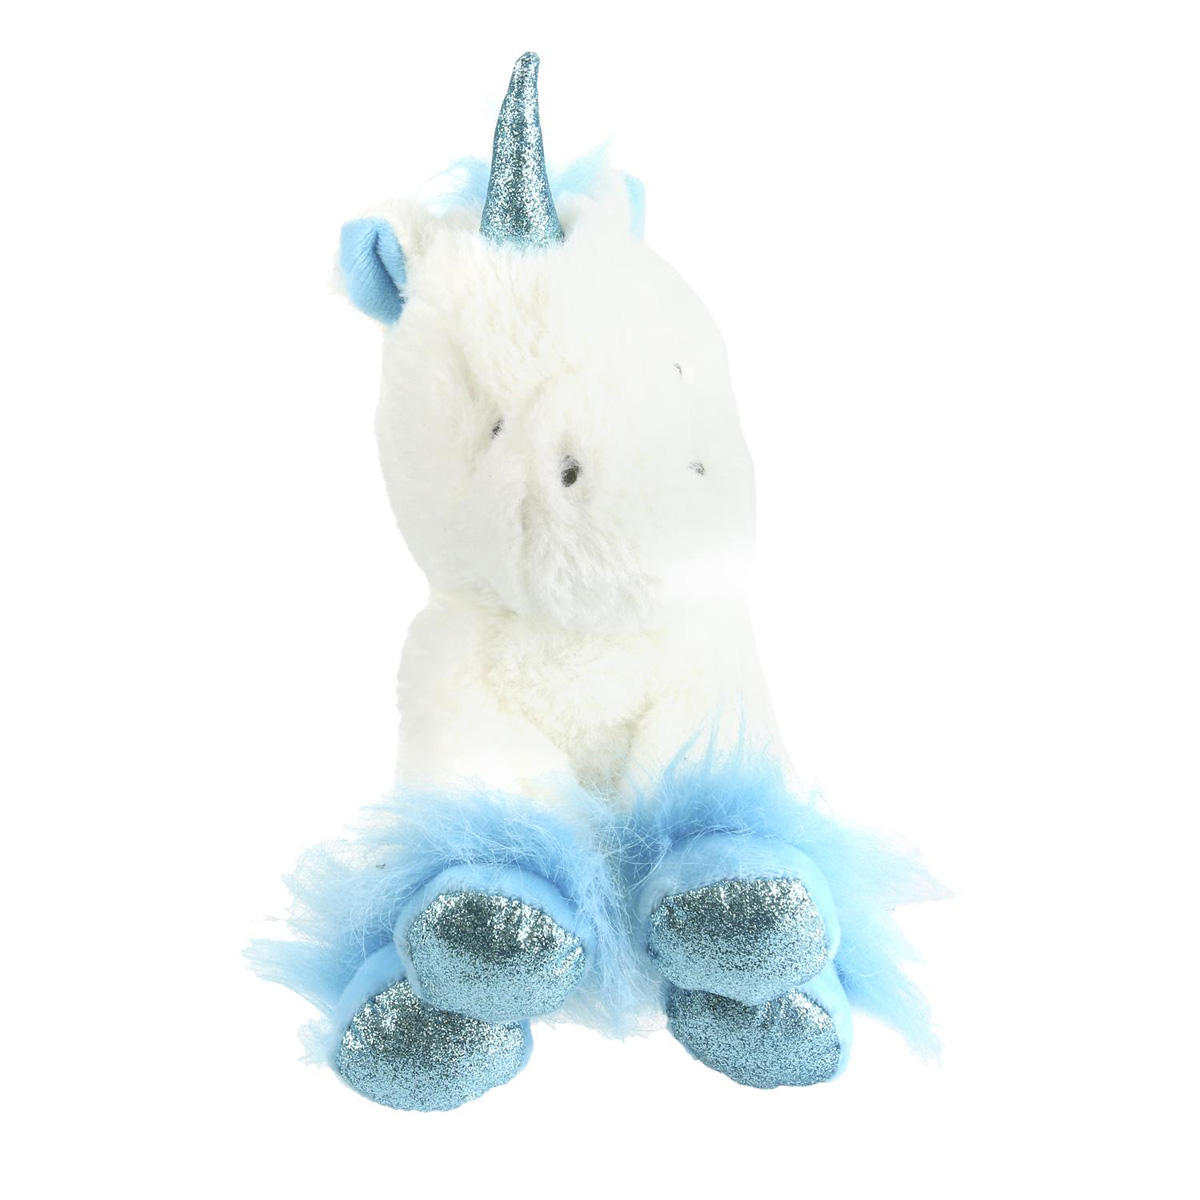 Peluche design \'Licorne My Unicorn\' bleu blanc - 20 cm - [Q4441]